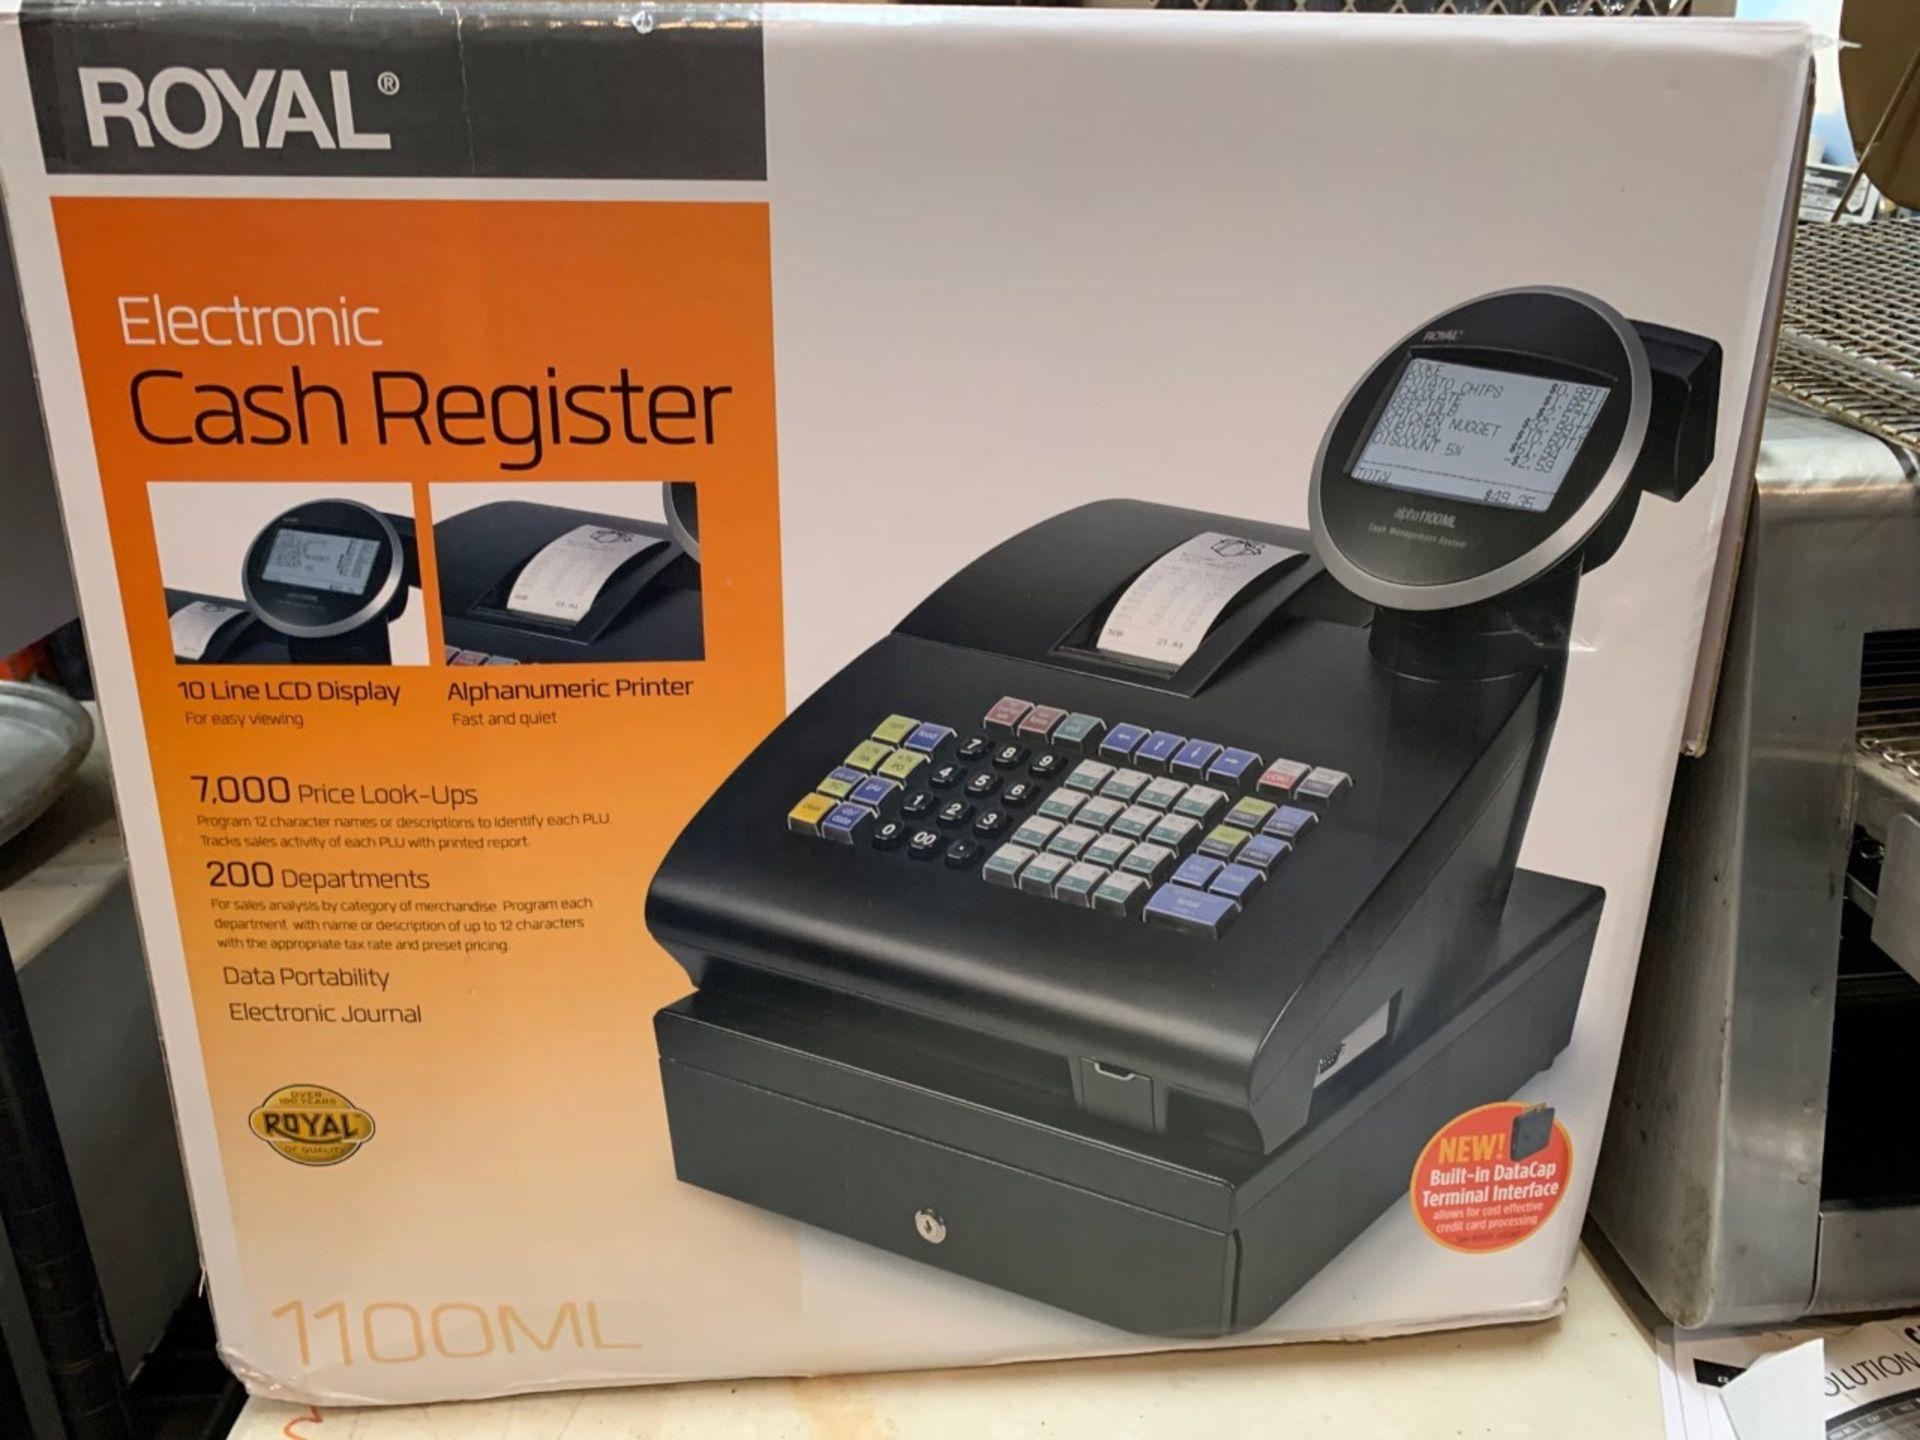 Lot 1459 - Royal Electronic Cash Register Model 1100ML